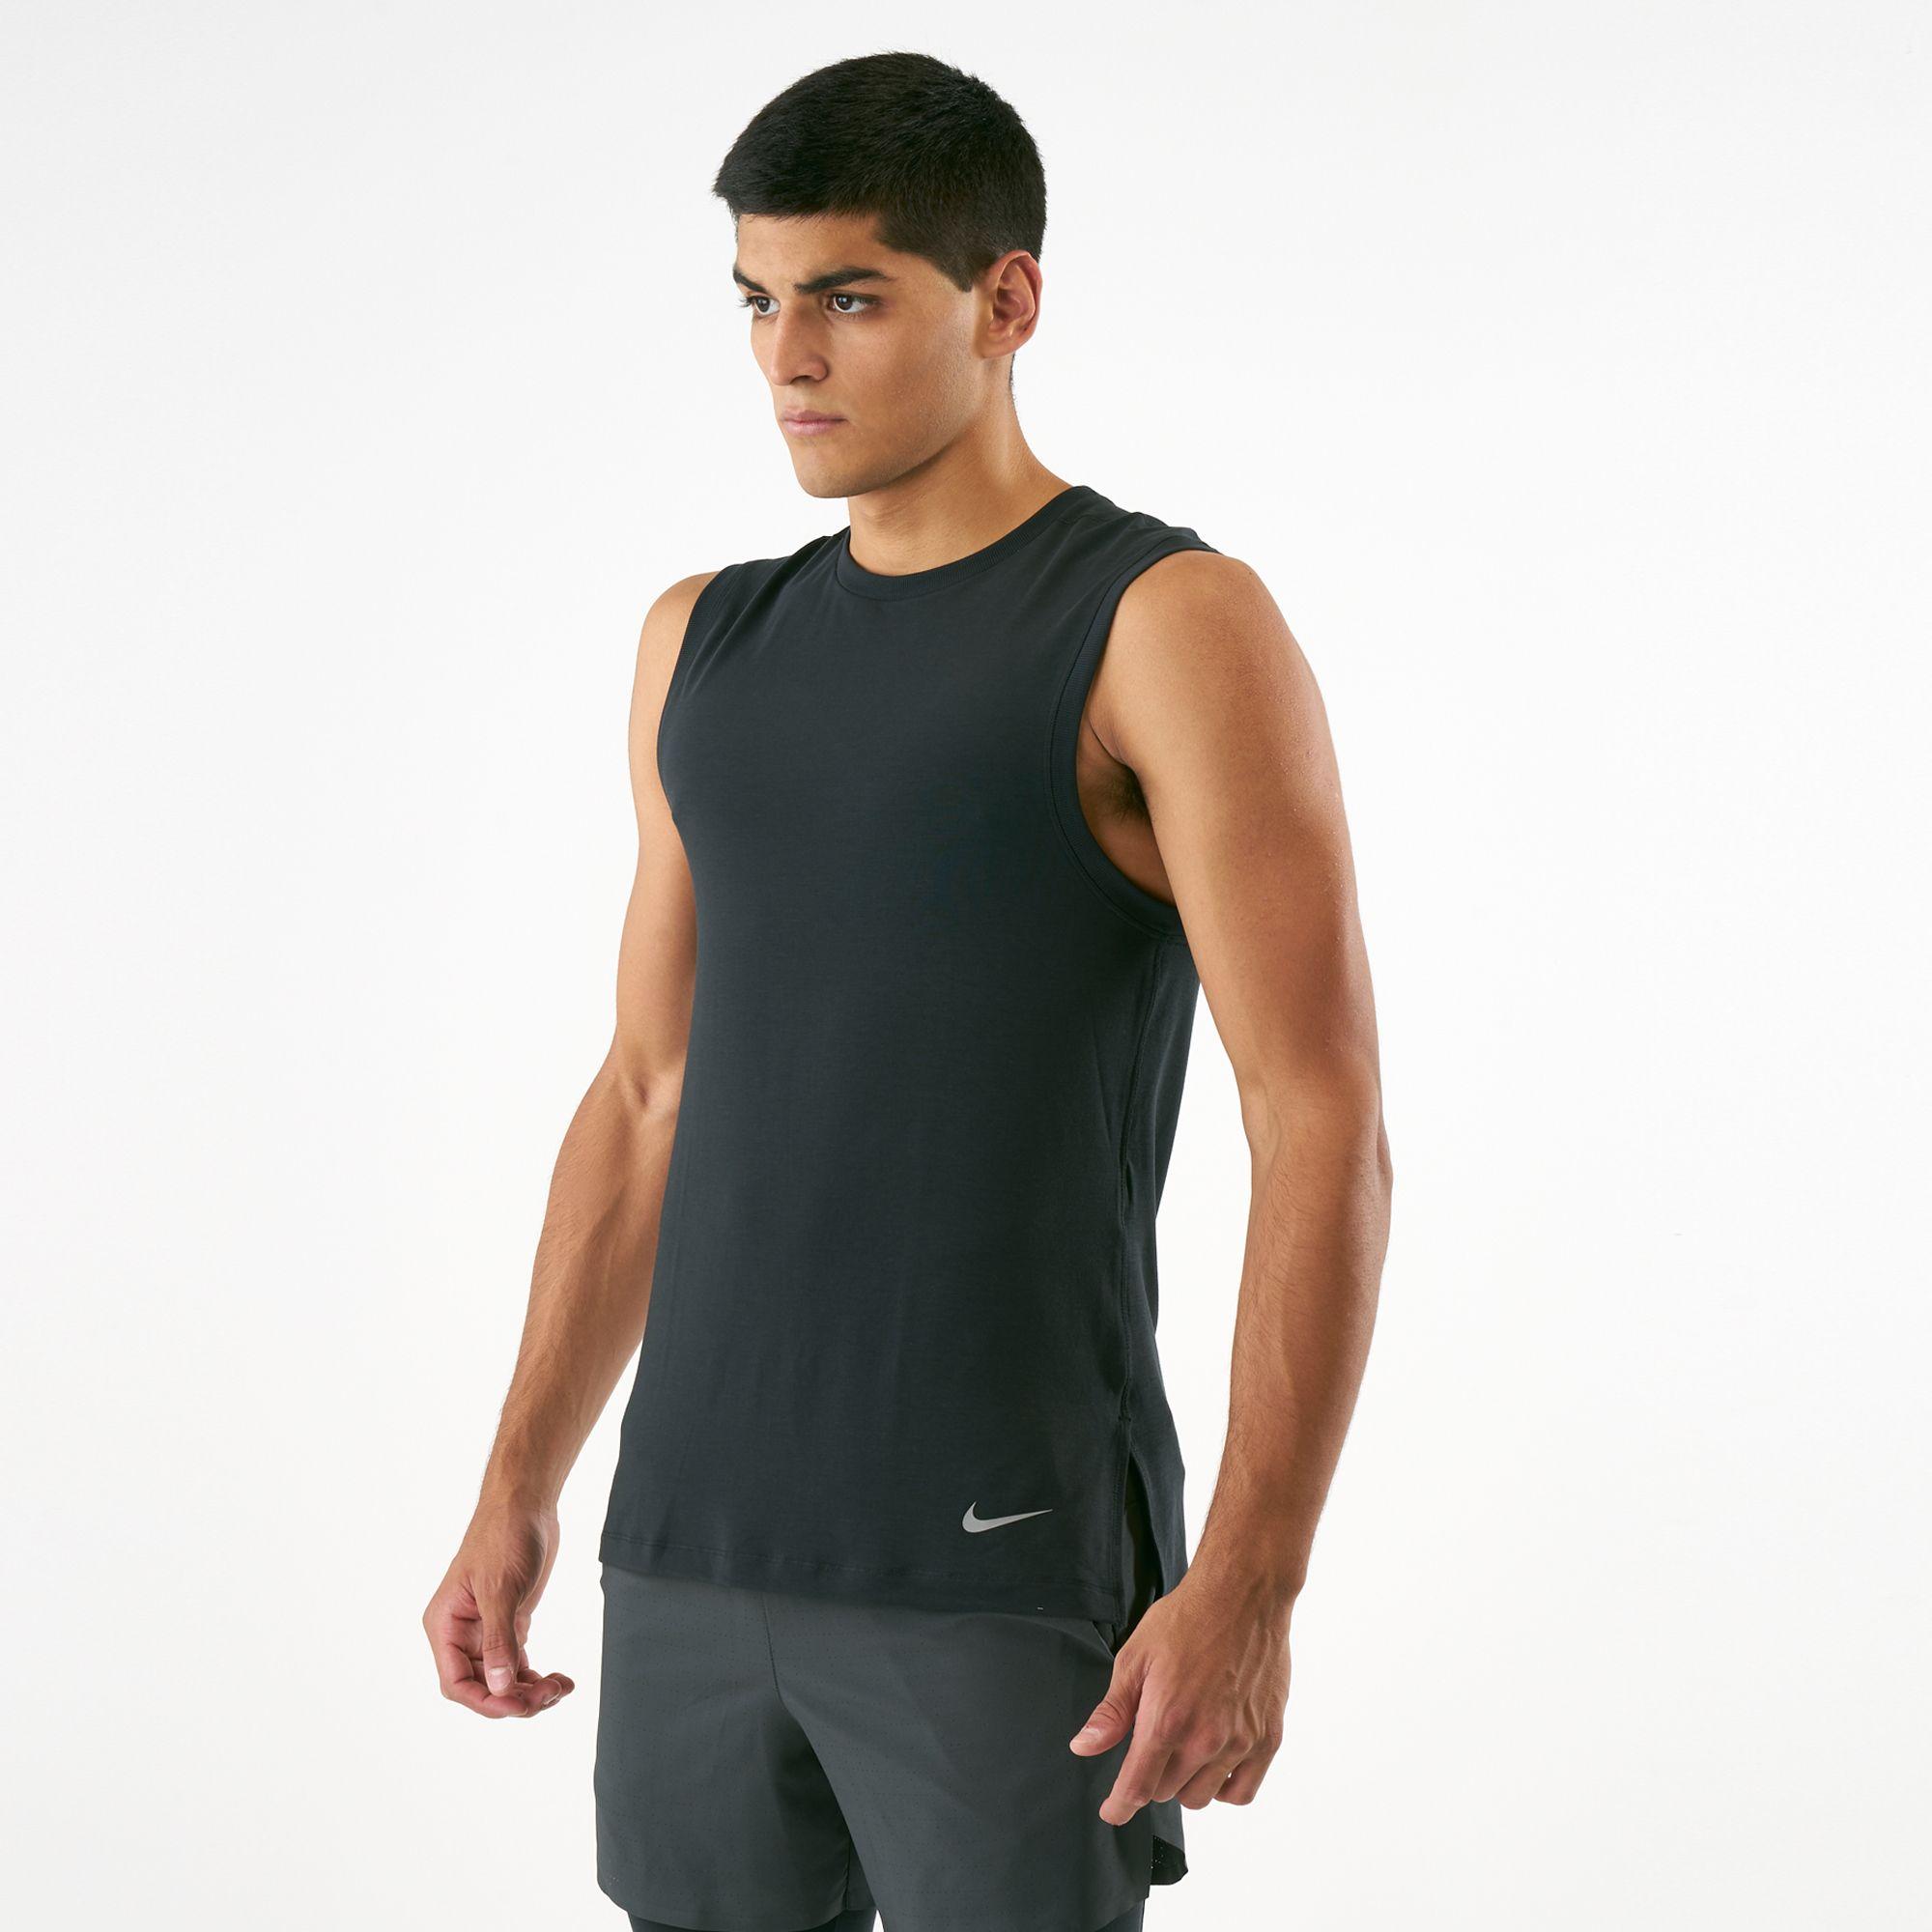 Nike Men S Dri Fit Yoga Training Tank Top Tank Tops Tops Clothing Mens Sss